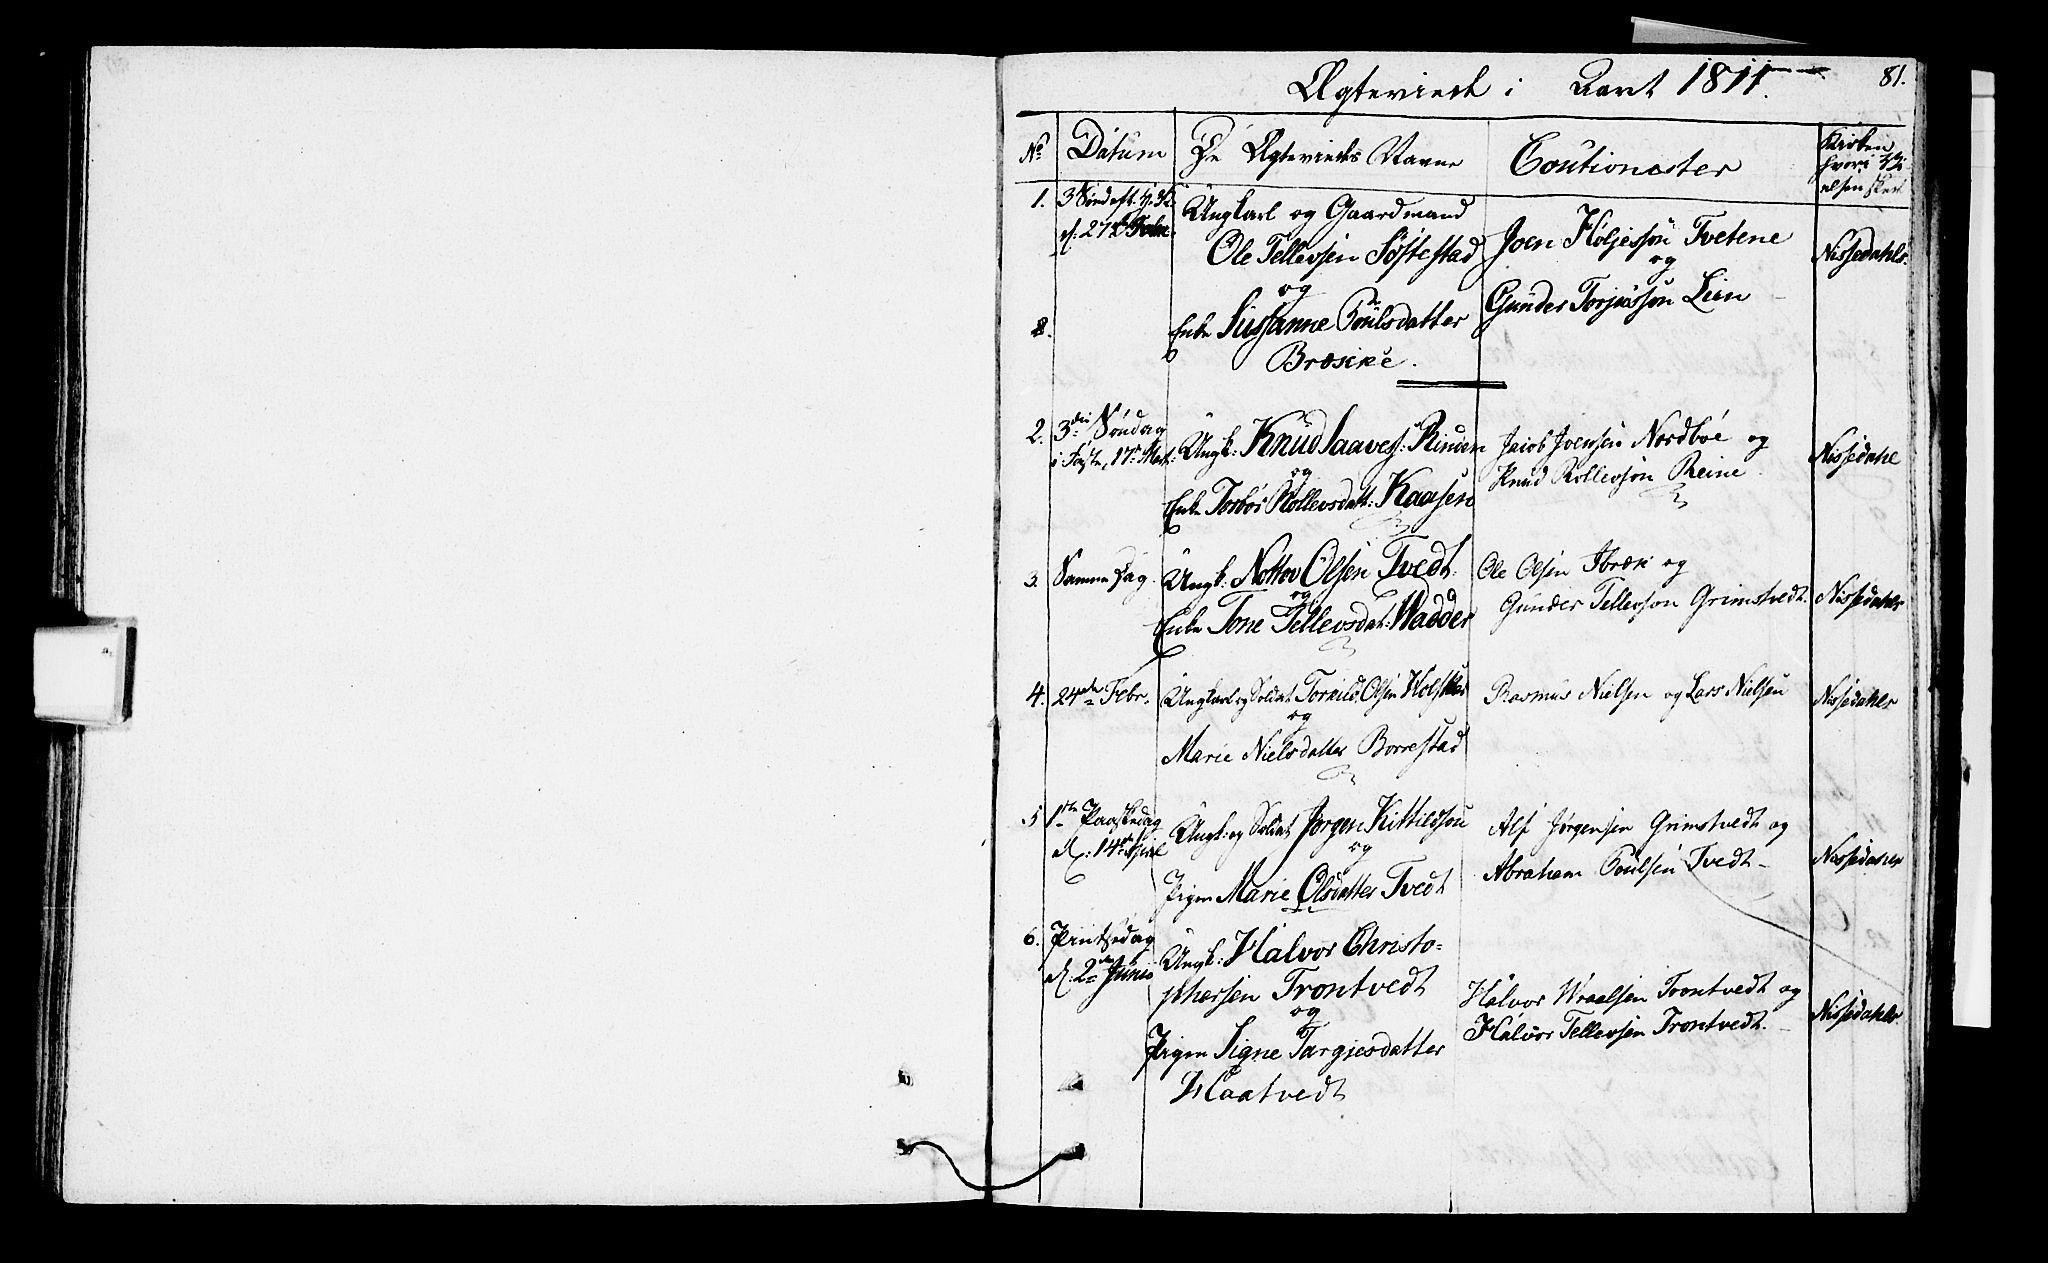 SAKO, Nissedal kirkebøker, F/Fa/L0001: Parish register (official) no. I 1, 1811-1814, p. 81